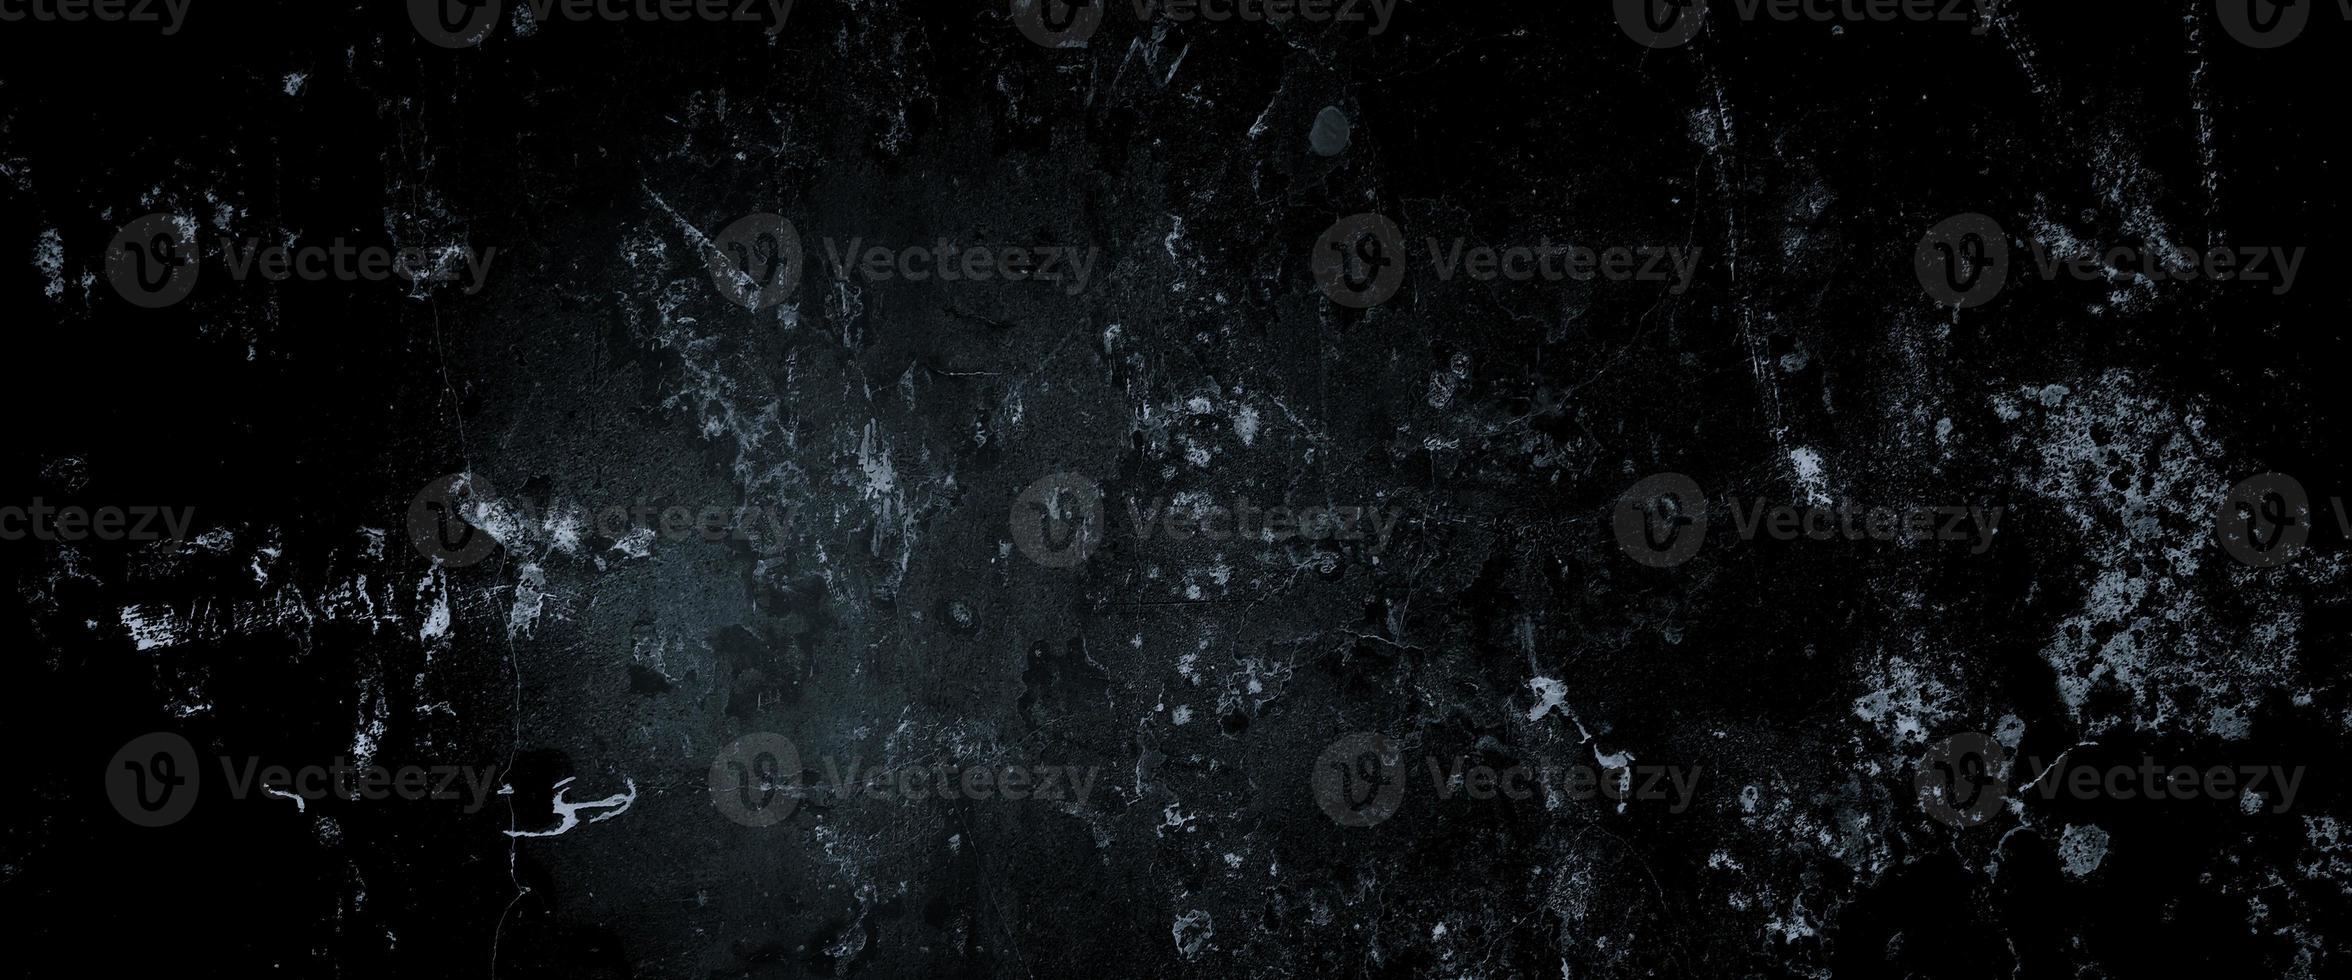 Muros oscuros de miedo, textura de cemento de hormigón negro ligeramente claro para el fondo foto